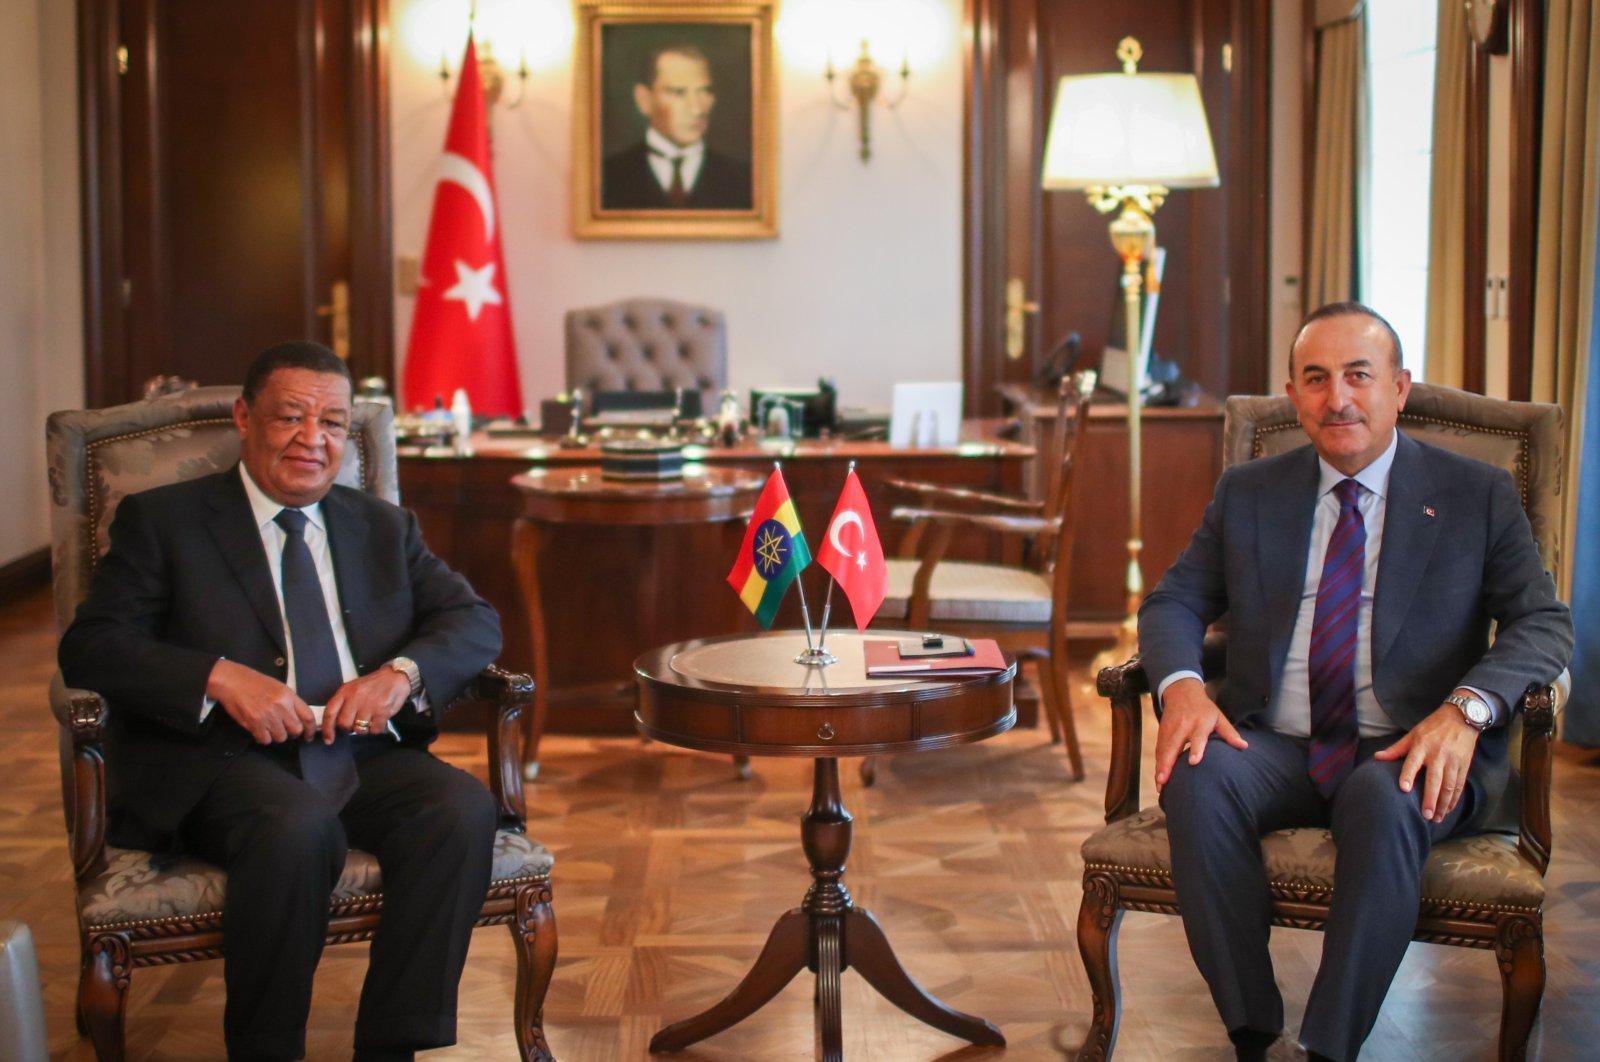 Foreign Minister Mevlüt Çavuşoğlu meets with Mulatu Teshome Wirtu, Ethiopia's former president and special representative of Prime Minister Abiy Ahmed, Ankara, Turkey, July 16, 2020. (AA Photo)